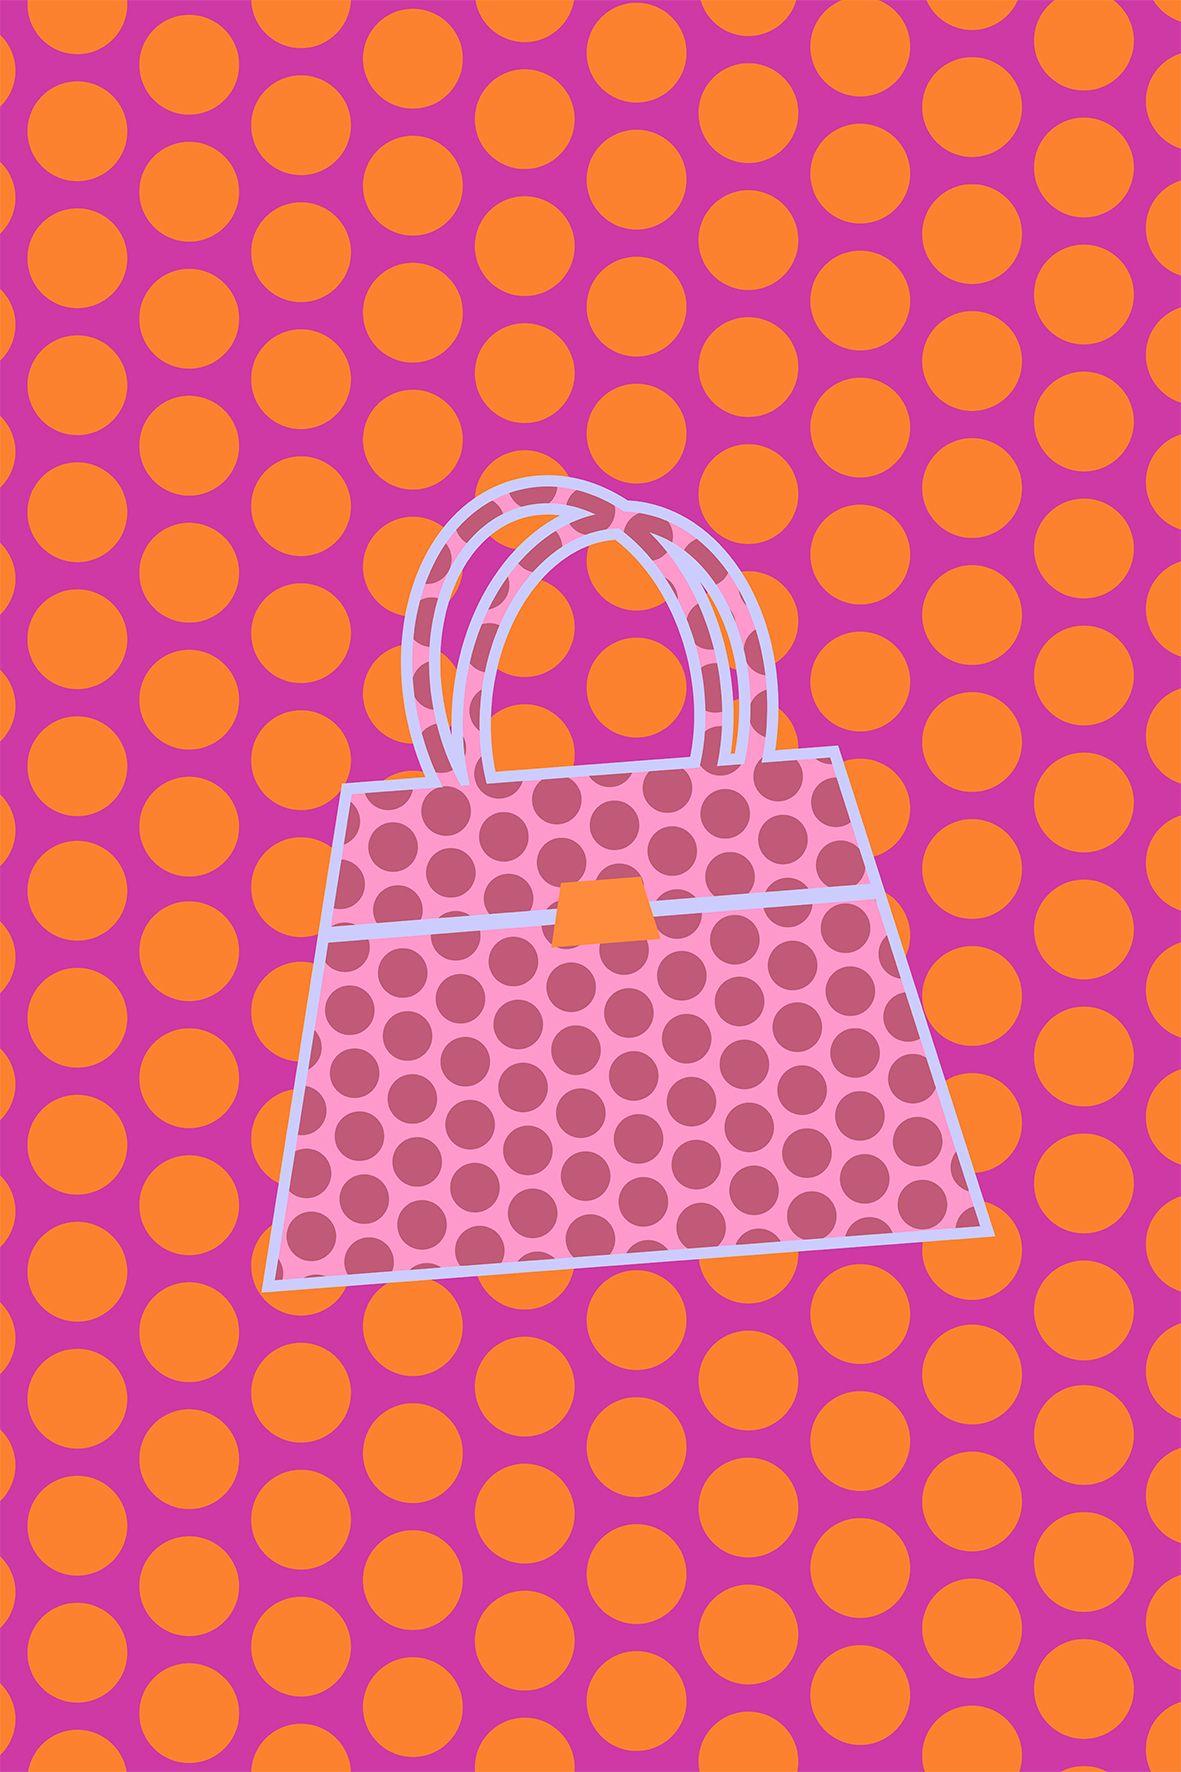 Handbag pop art polka dots by dimitrios pop art